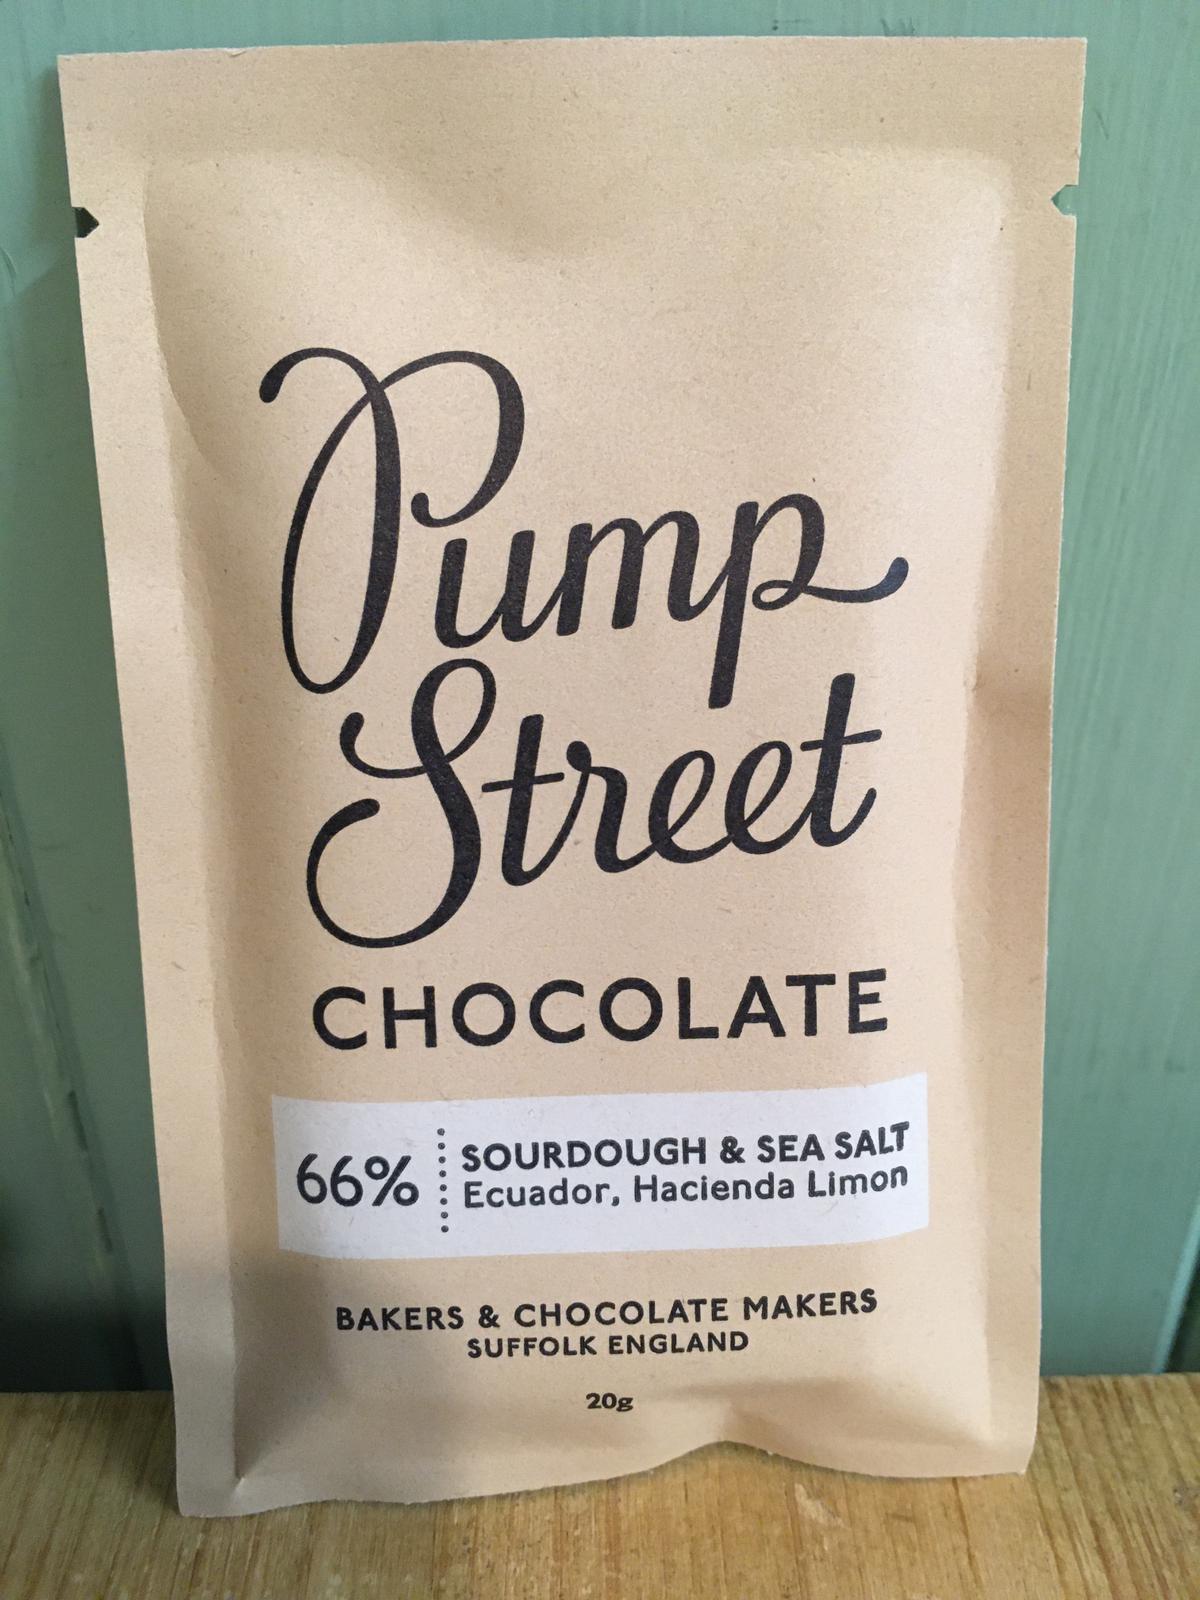 Pump Street Chocolate - Sourdough and Sea Salt 66% Dark Chocolate Bar 20g